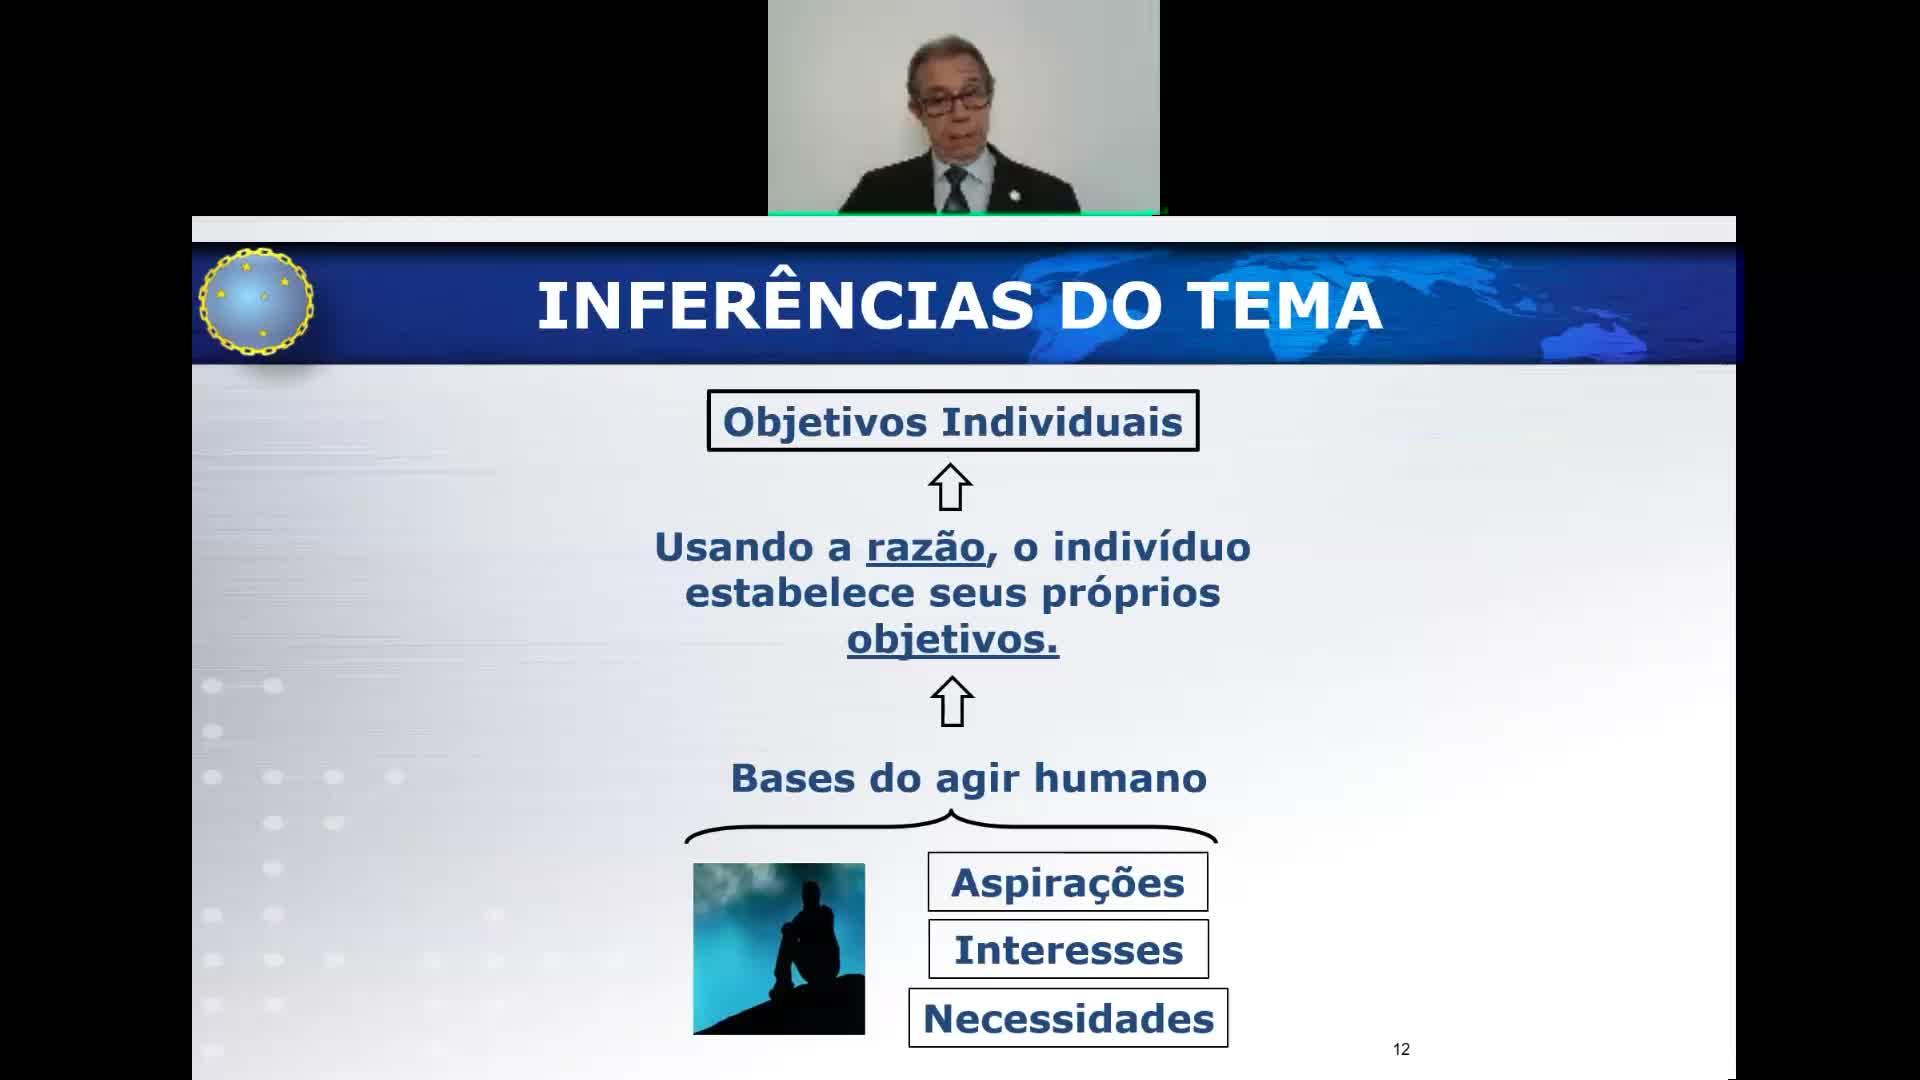 Videoaula 1 - Objetivos Nacionais - Cel (R1 _ EB) Cabrita